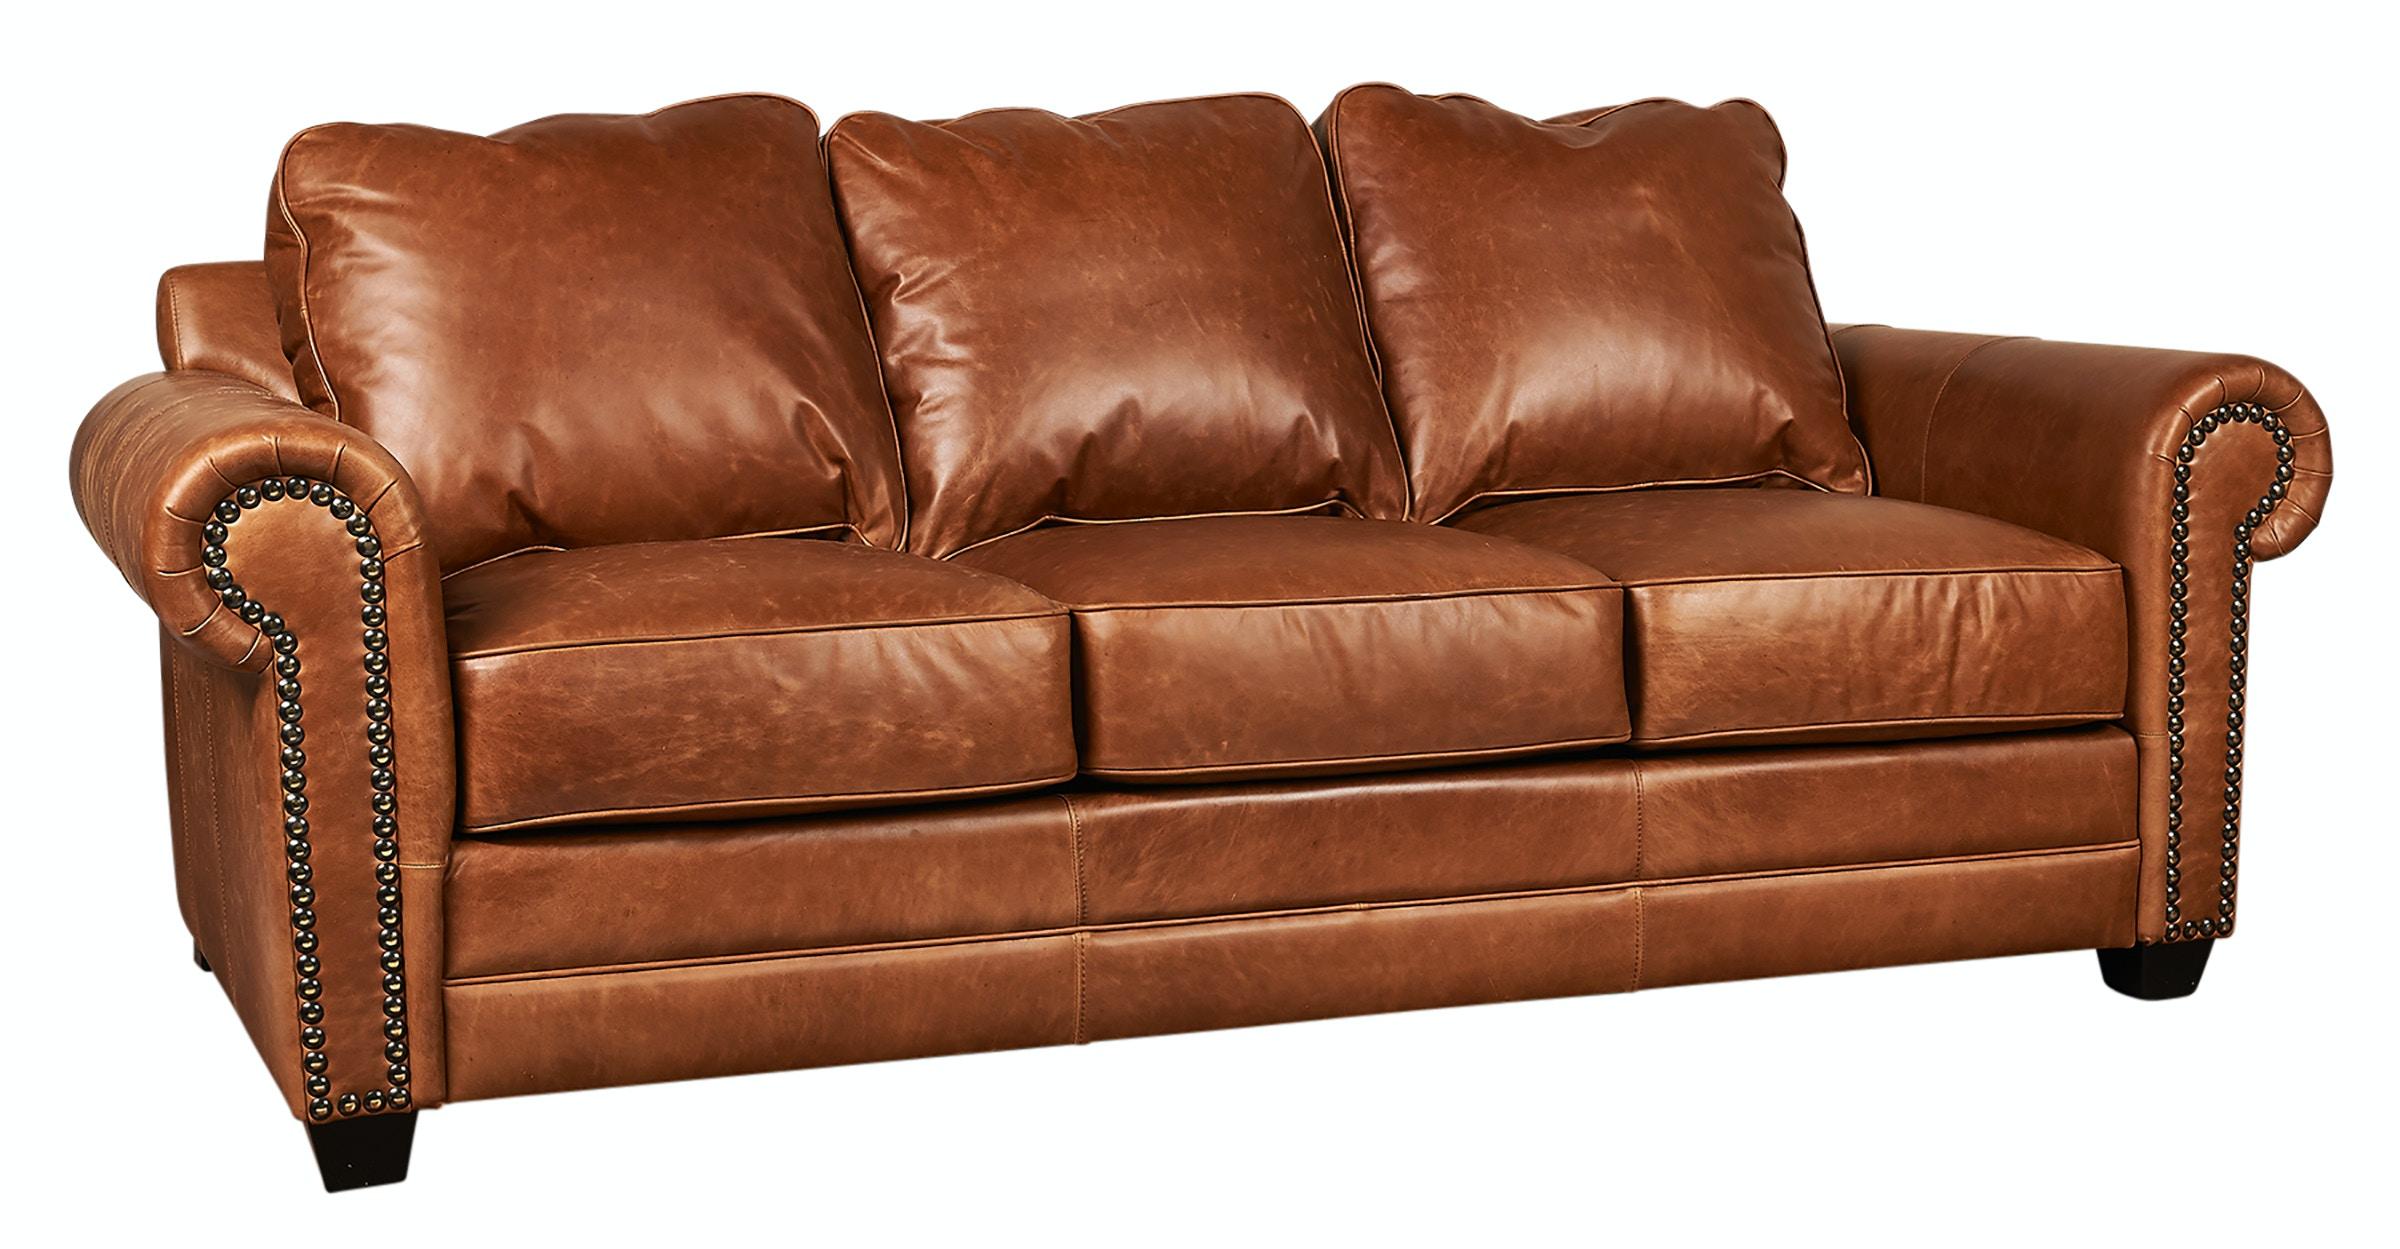 Marvelous Woodleyu0027s Fine Furniture